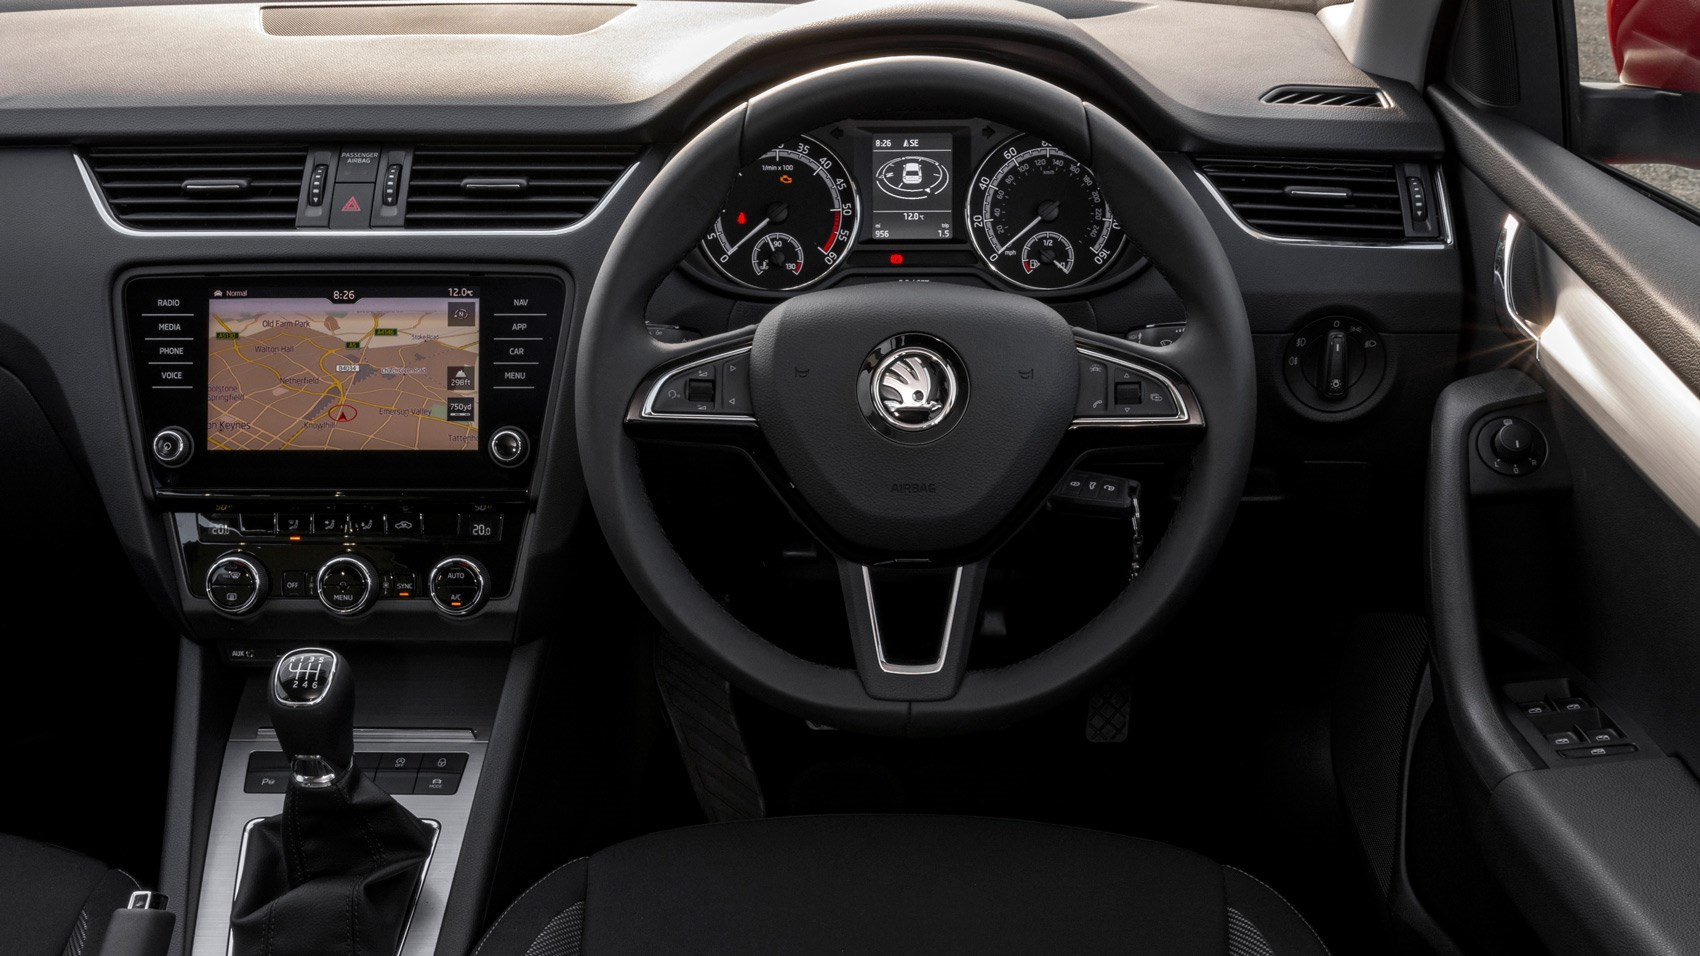 Skoda Octavia 10 Tsi 2017 Review Car Magazine Pick Up 1 3 Engine Diagram Interior